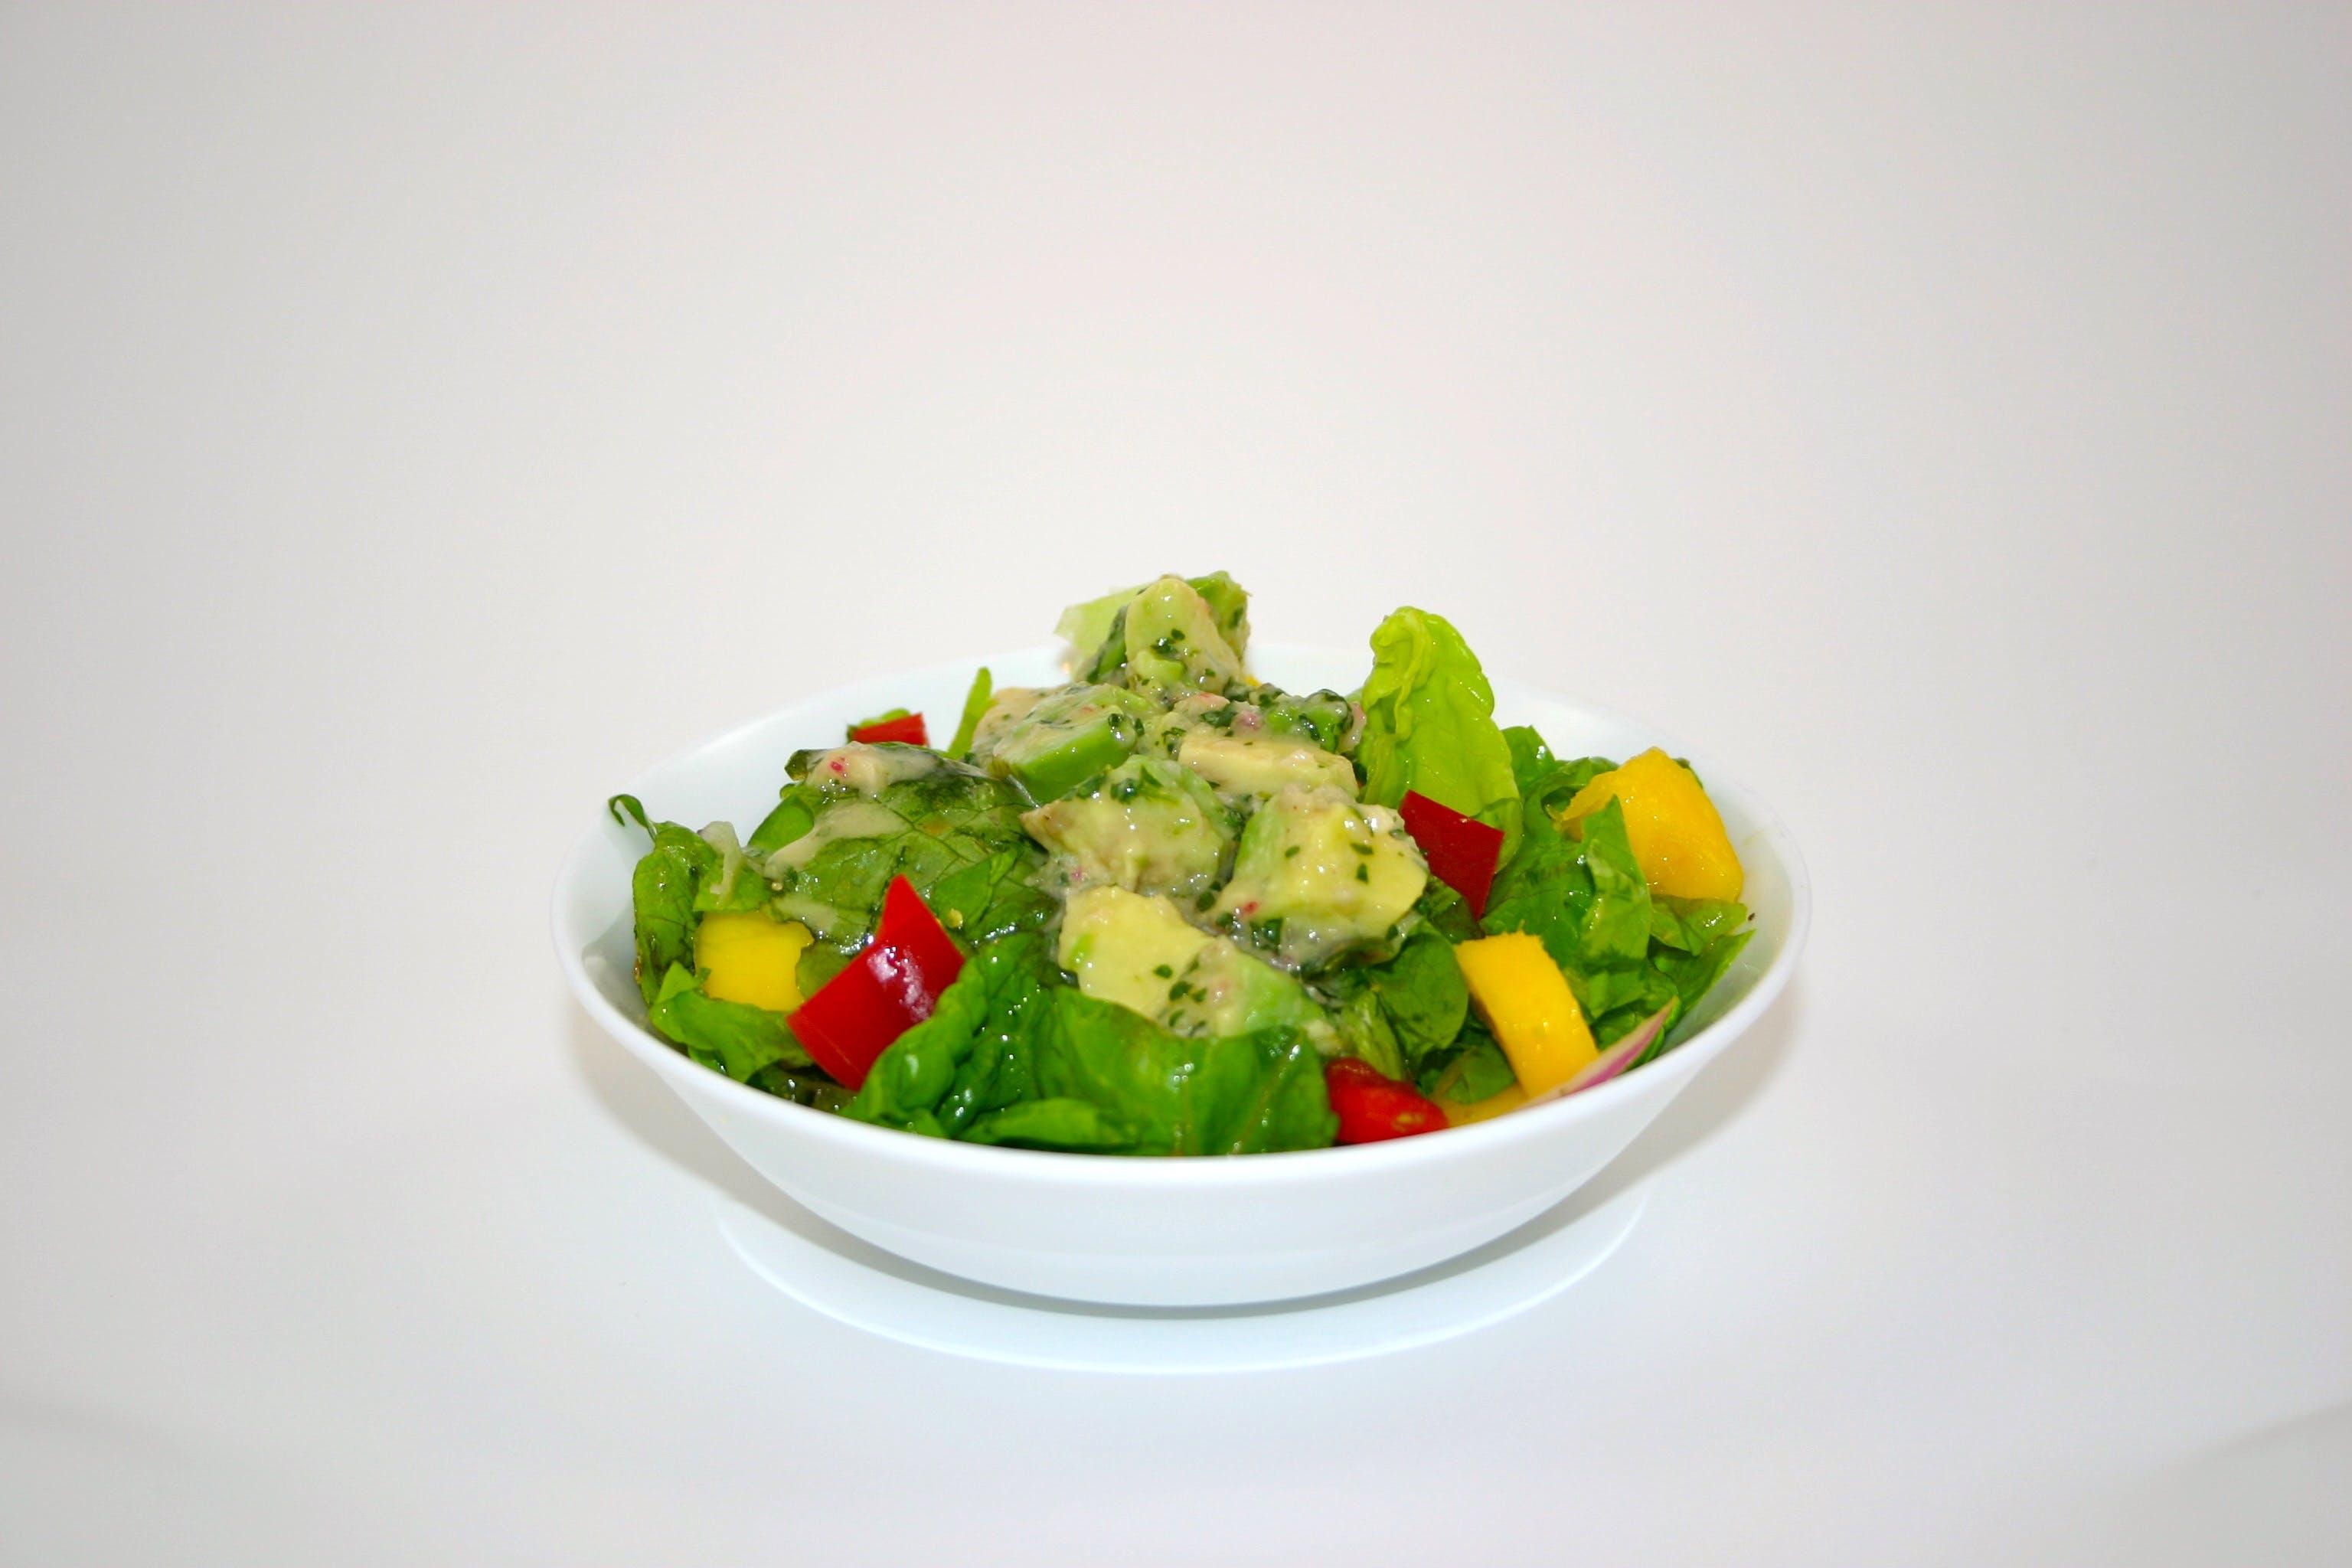 Free stock photo of salad dressing